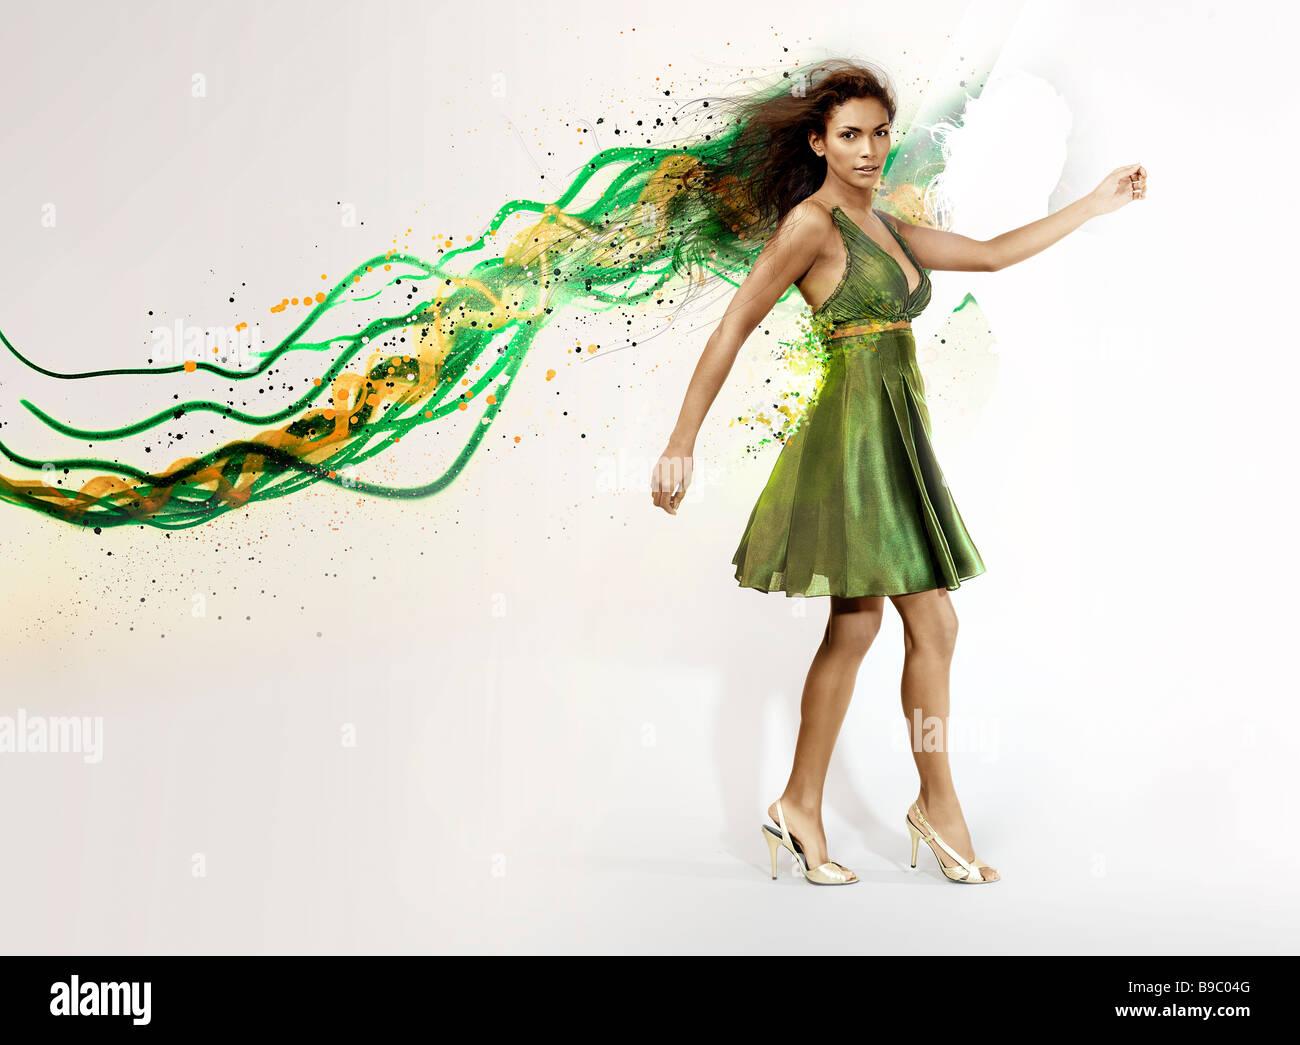 Girl. Movement. Illustrative Background. Graphical Shot. Fashion. Ethnic. Mixed Race. Model. - Stock Image